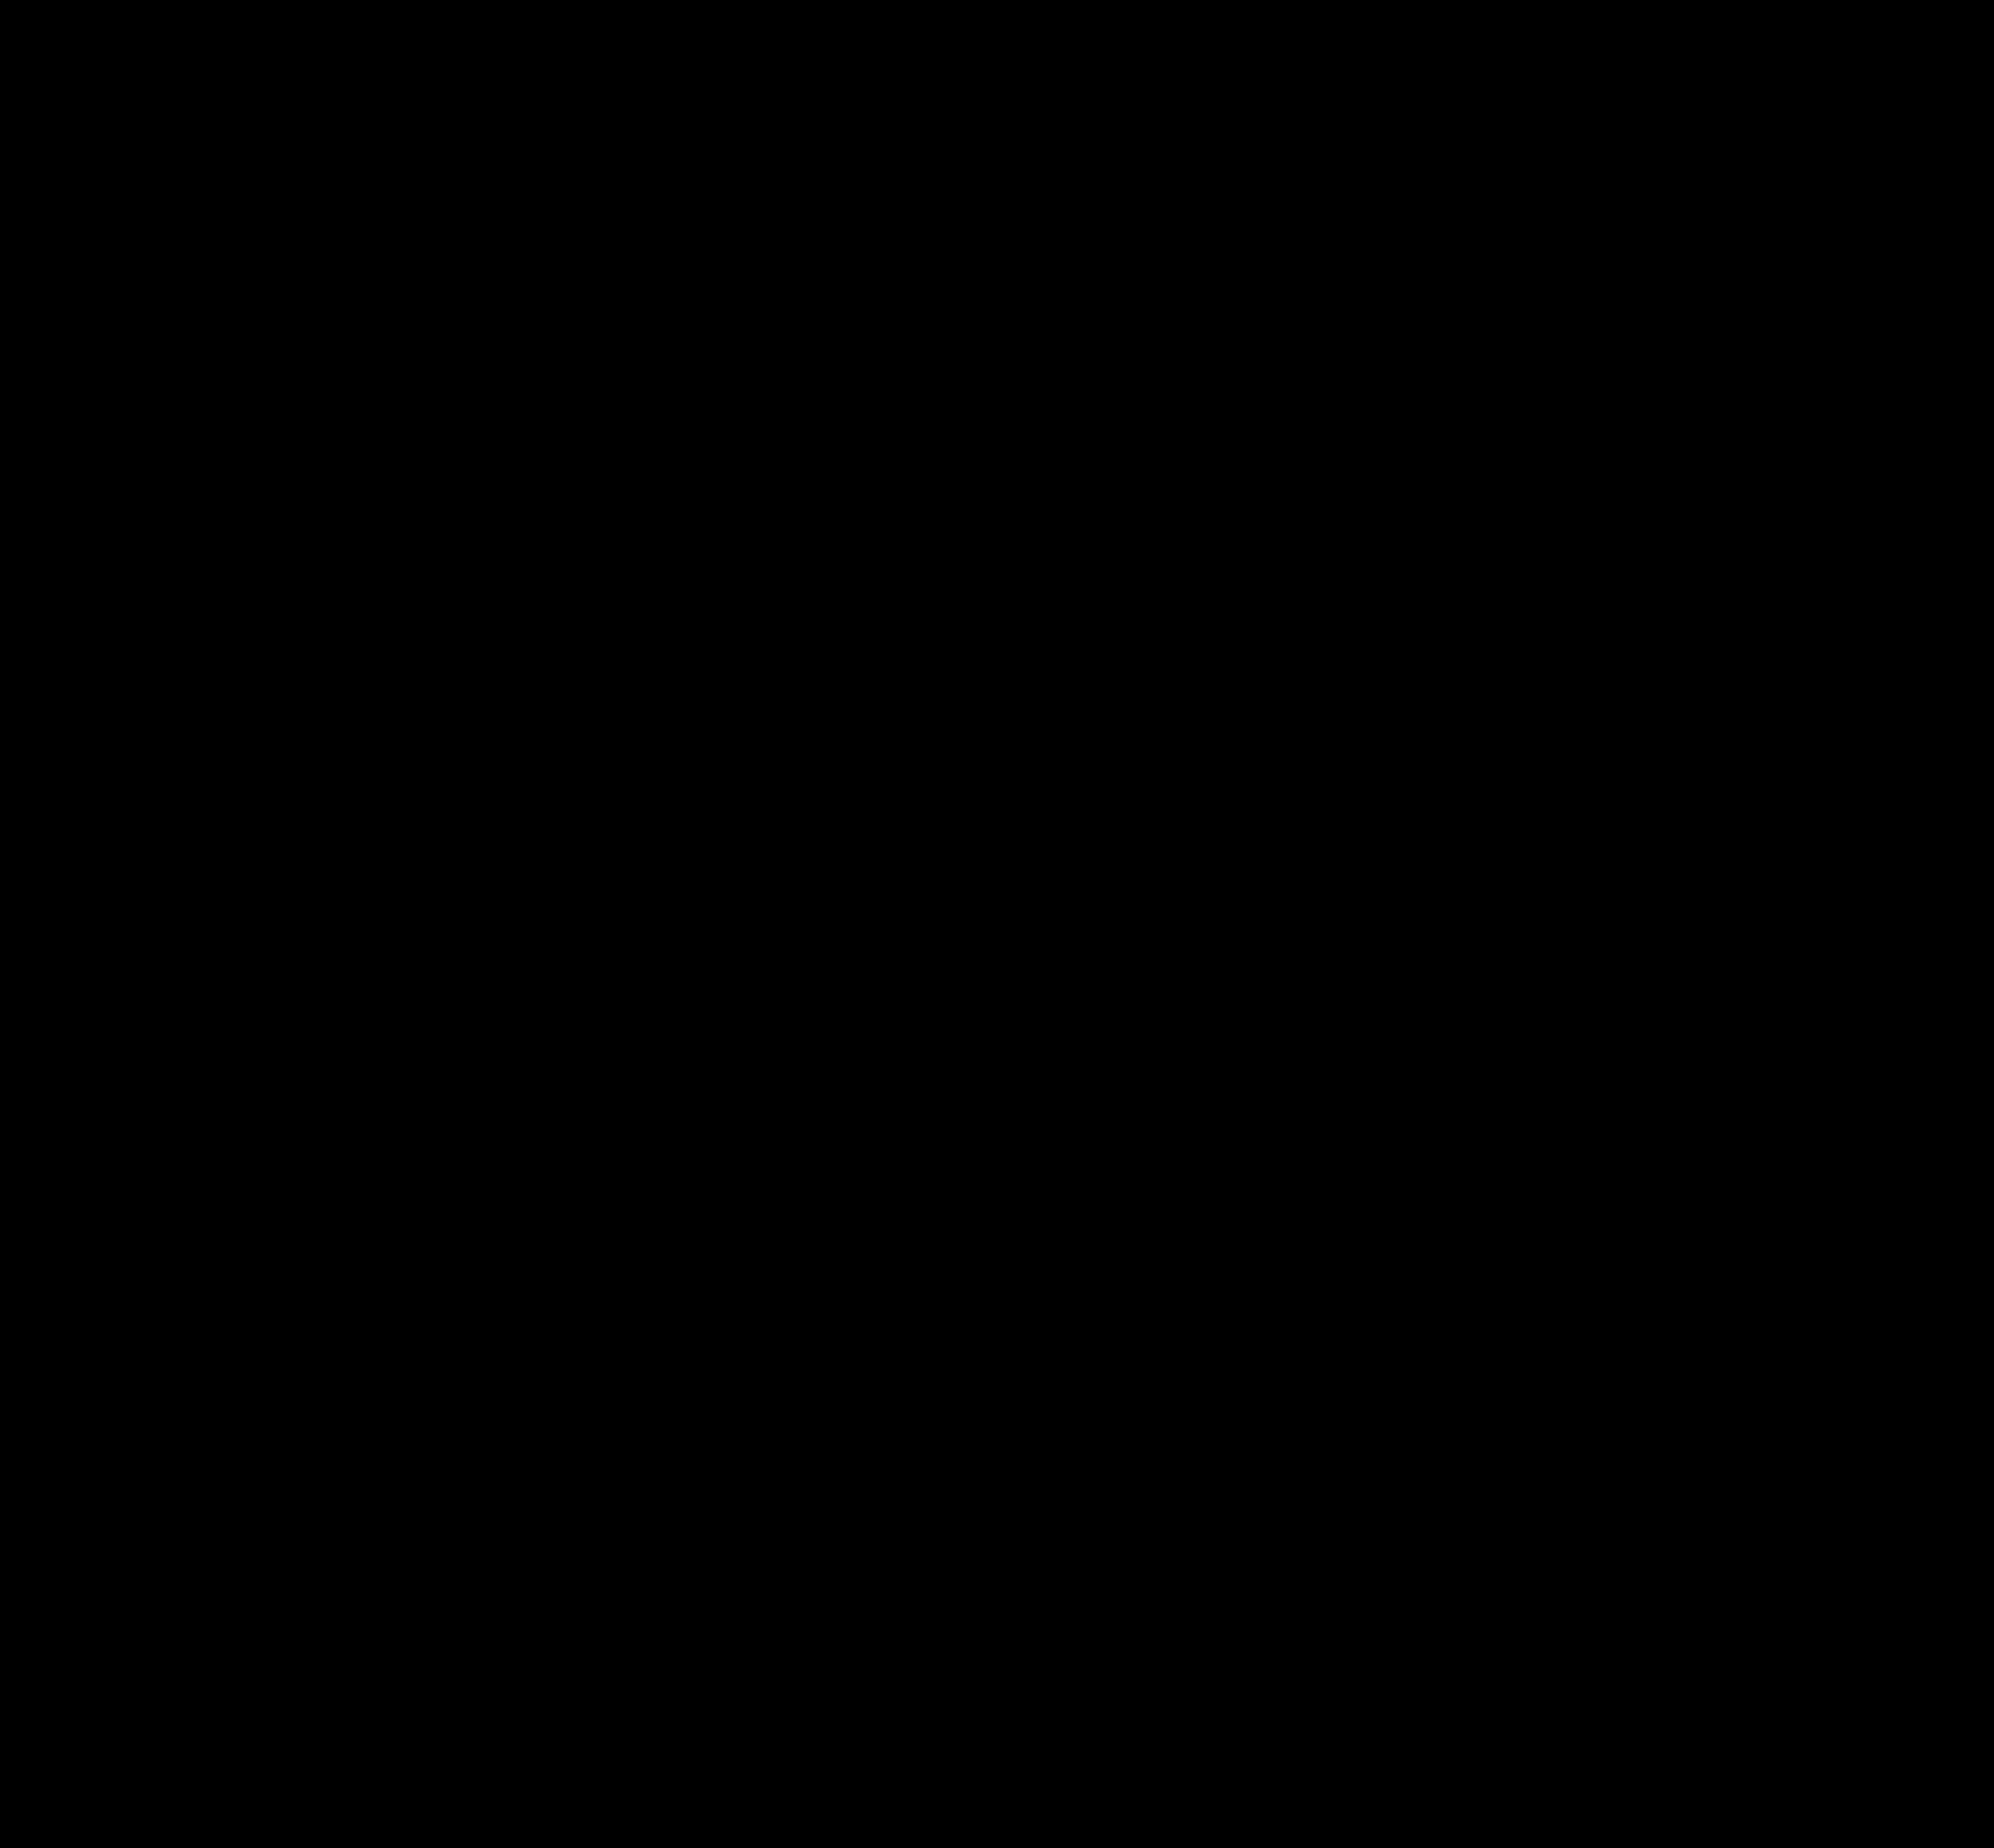 Open book clip art. Emoji clipart simple